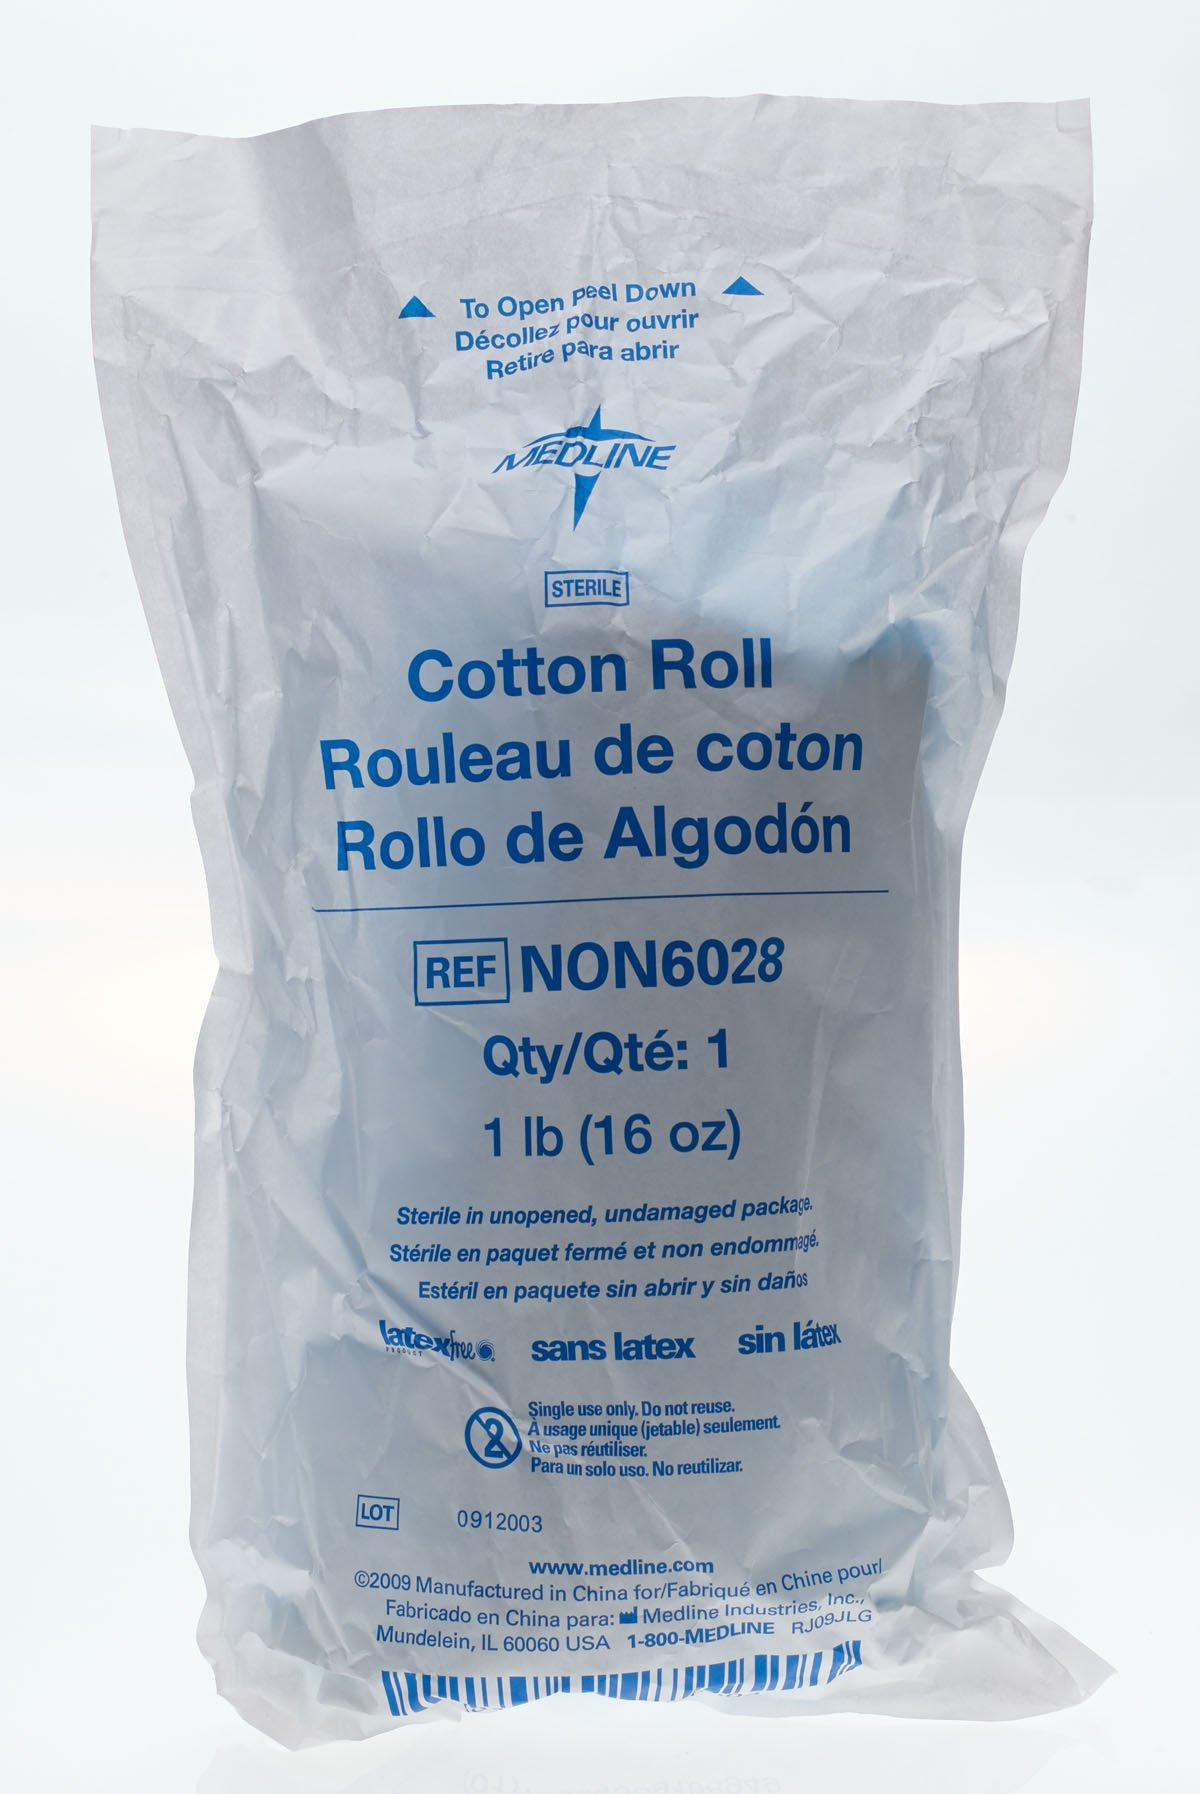 Medline NON6028H Cotton Roll, Sterile, 1 lb, Large